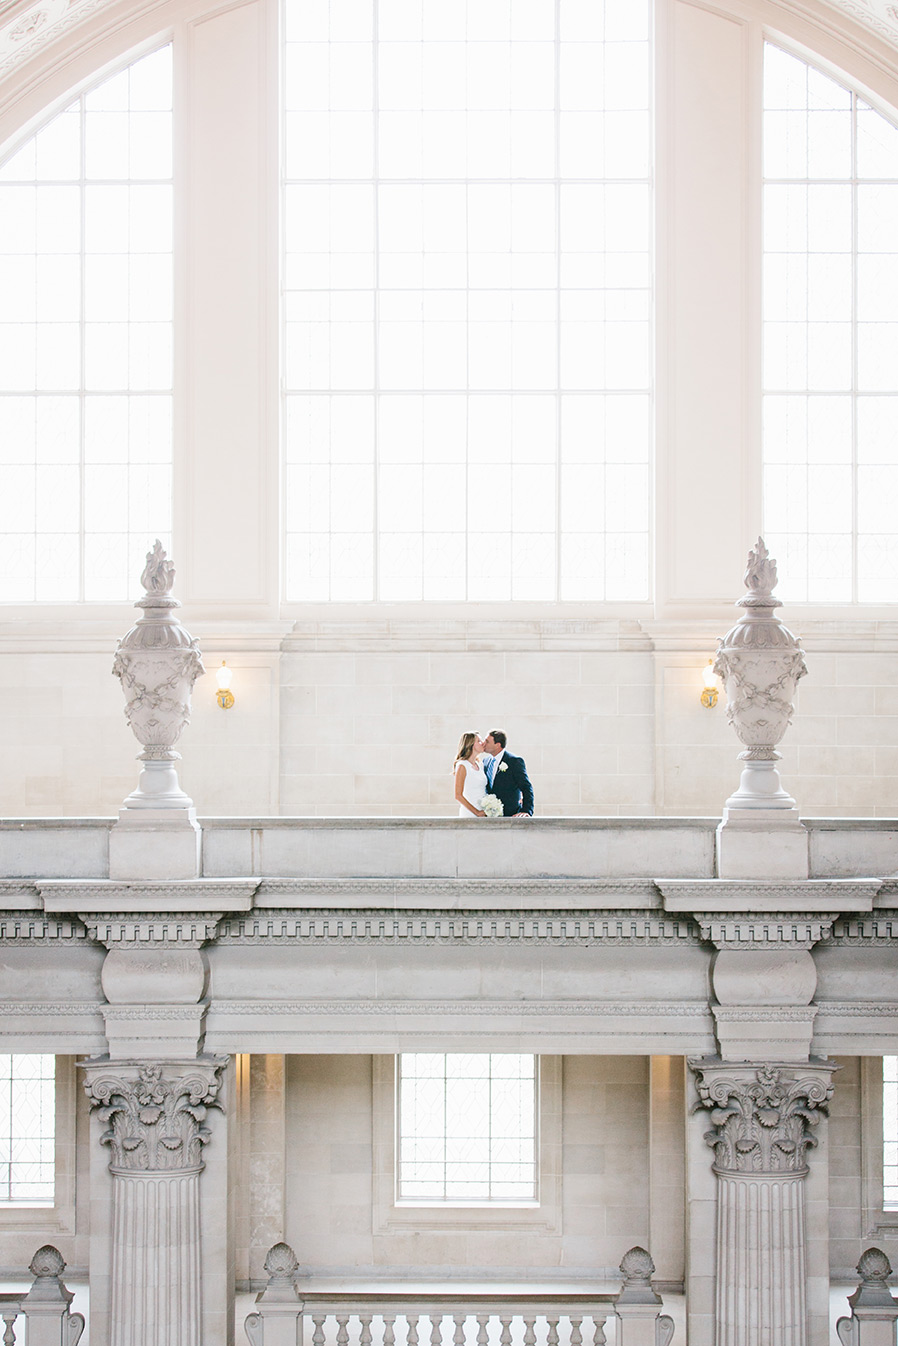 Fourth_Floor_SanFrancisco_City_Hall_Bride_Groom_kiss_SonyaYruel.jpg